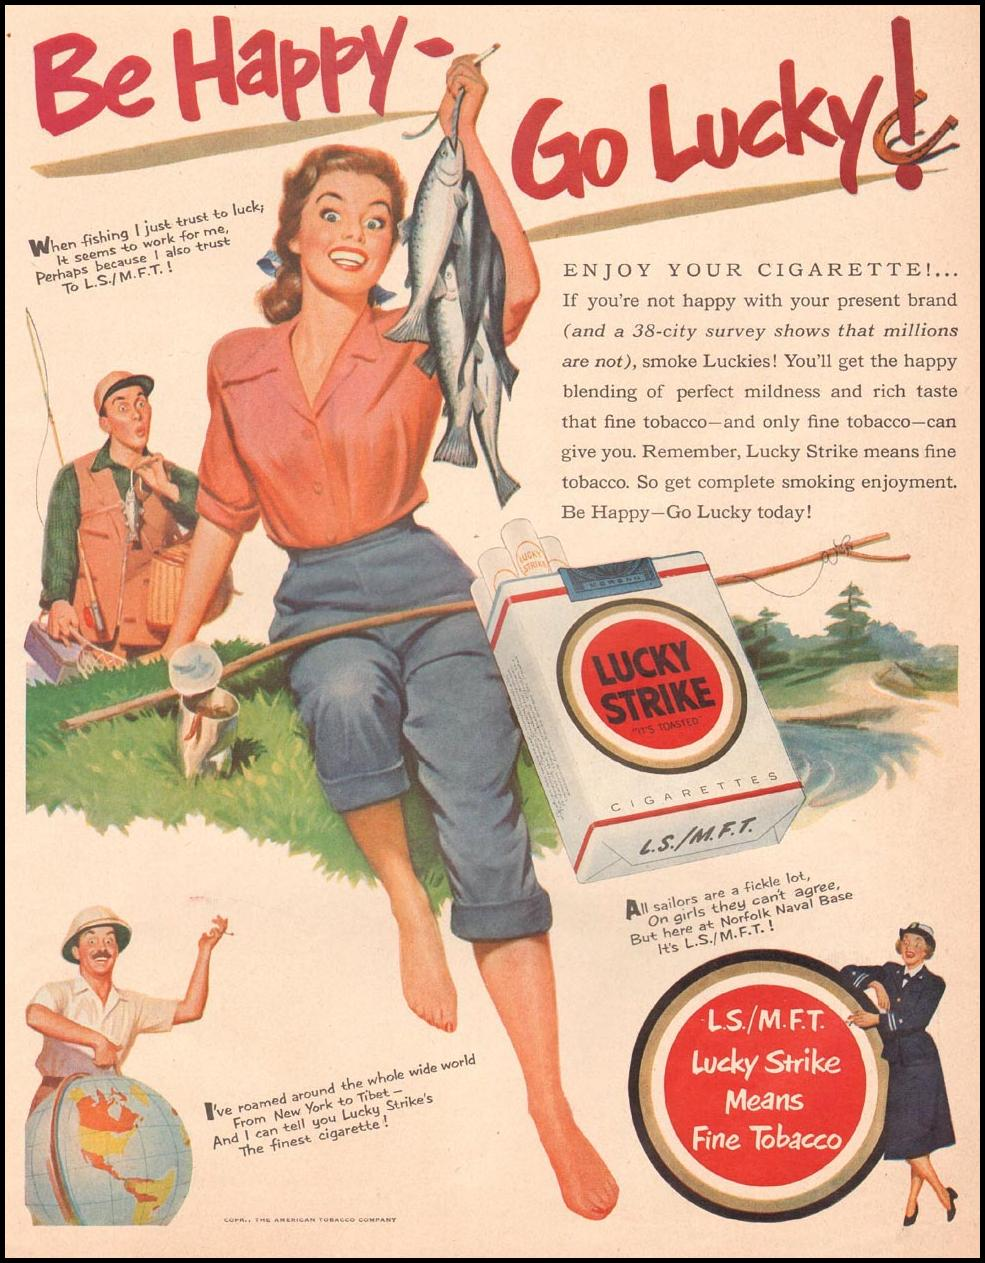 lucky-life-04-30-1951-043-m5